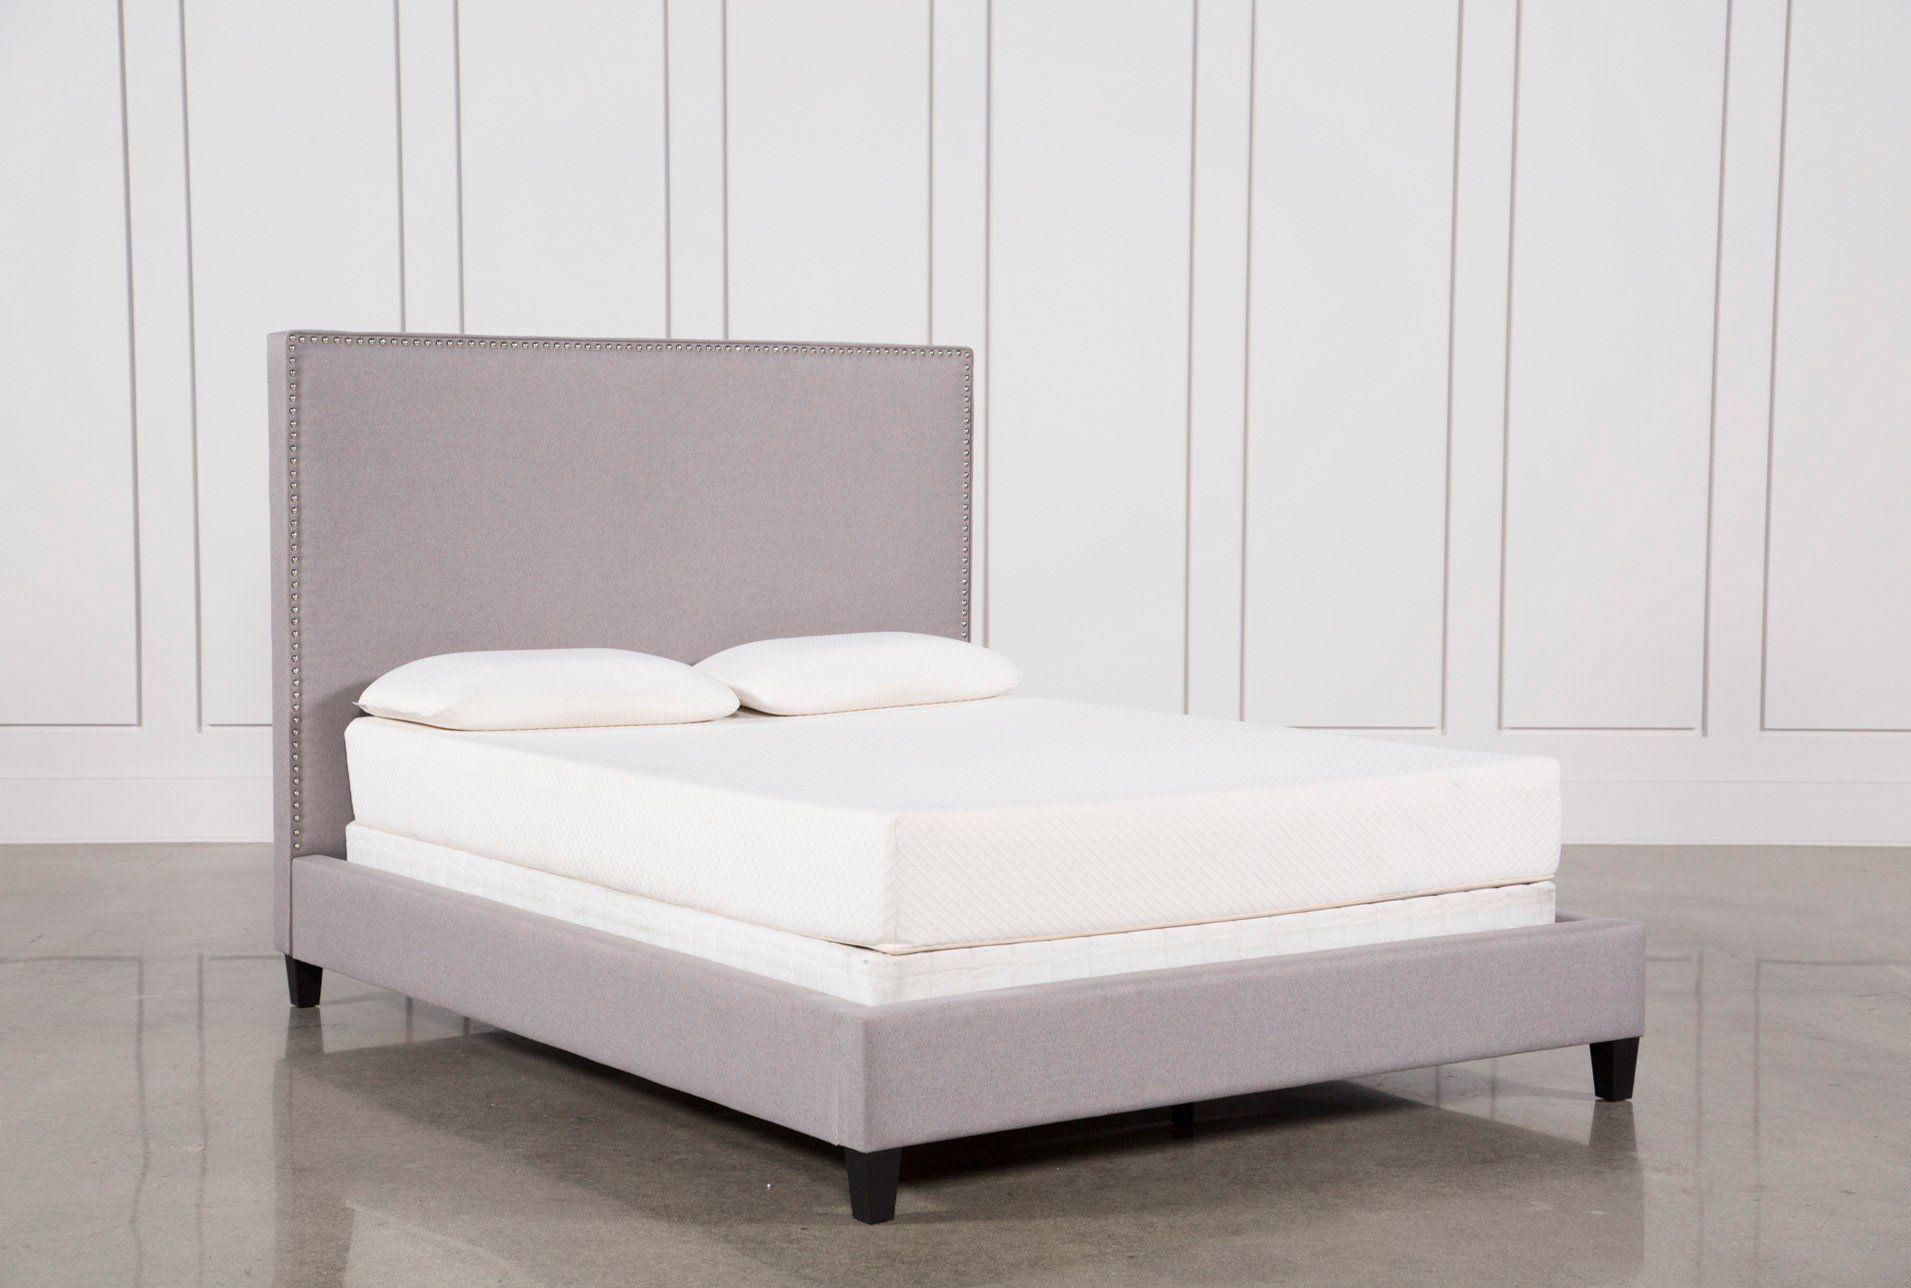 Shop For Kaelyn Queen Upholstered Panel Bed At Livingspaces Com Enjoy Free Store Pick Up Same Day Shipp Panel Bed Upholstered Panel Bed Affordable Bed Frames